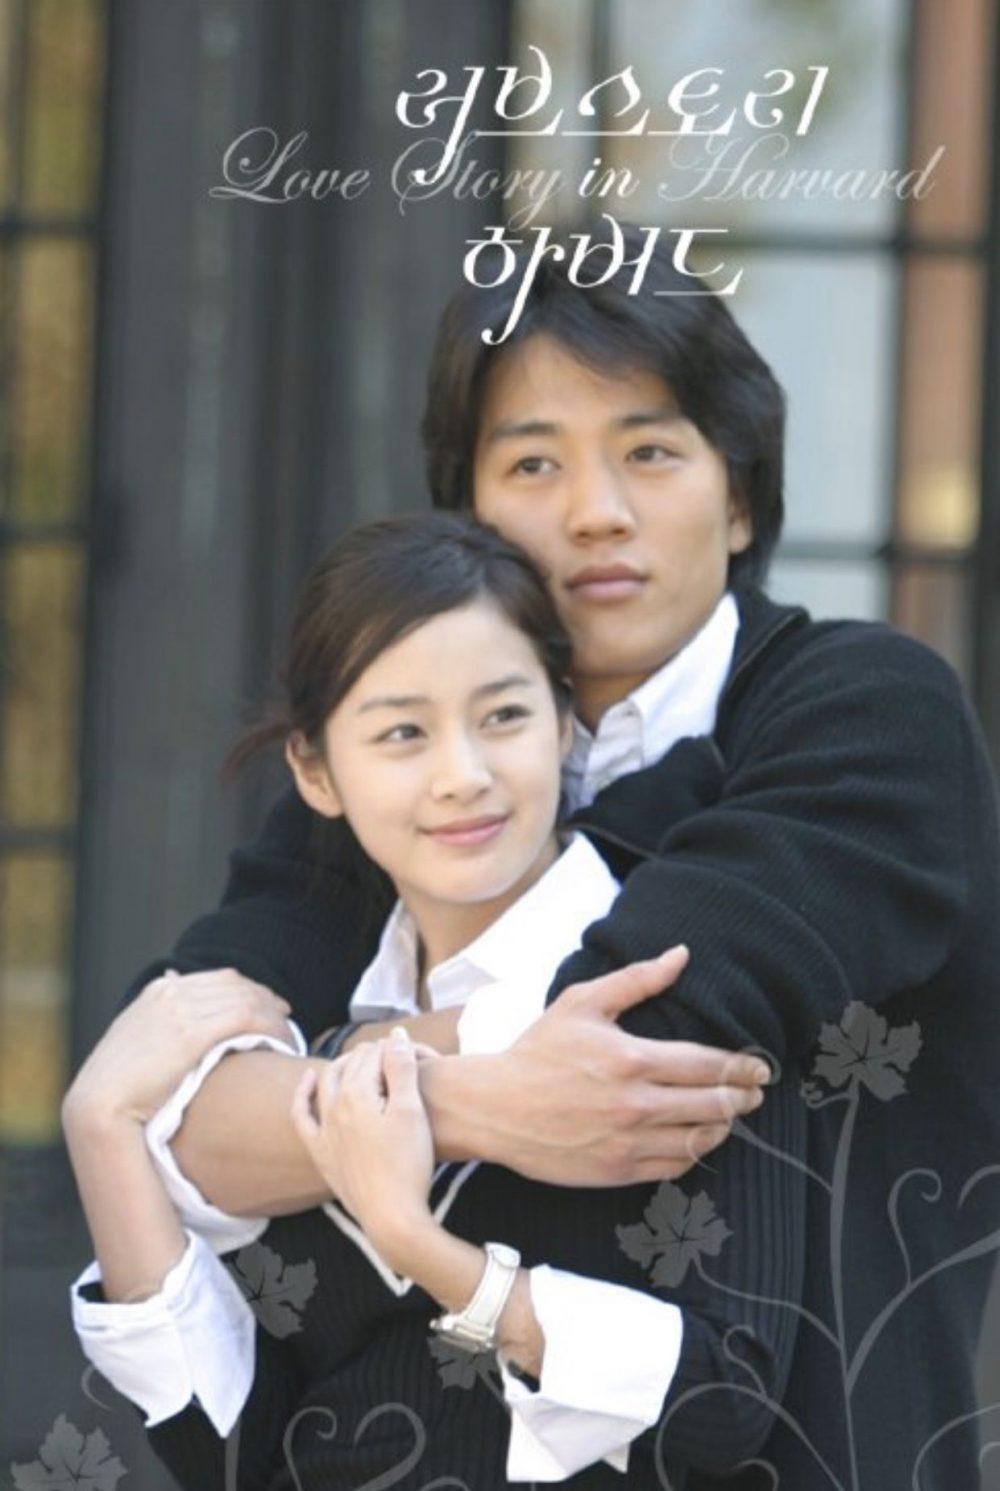 Chuyện tình Harvard - Love Story in Harvard (2004)